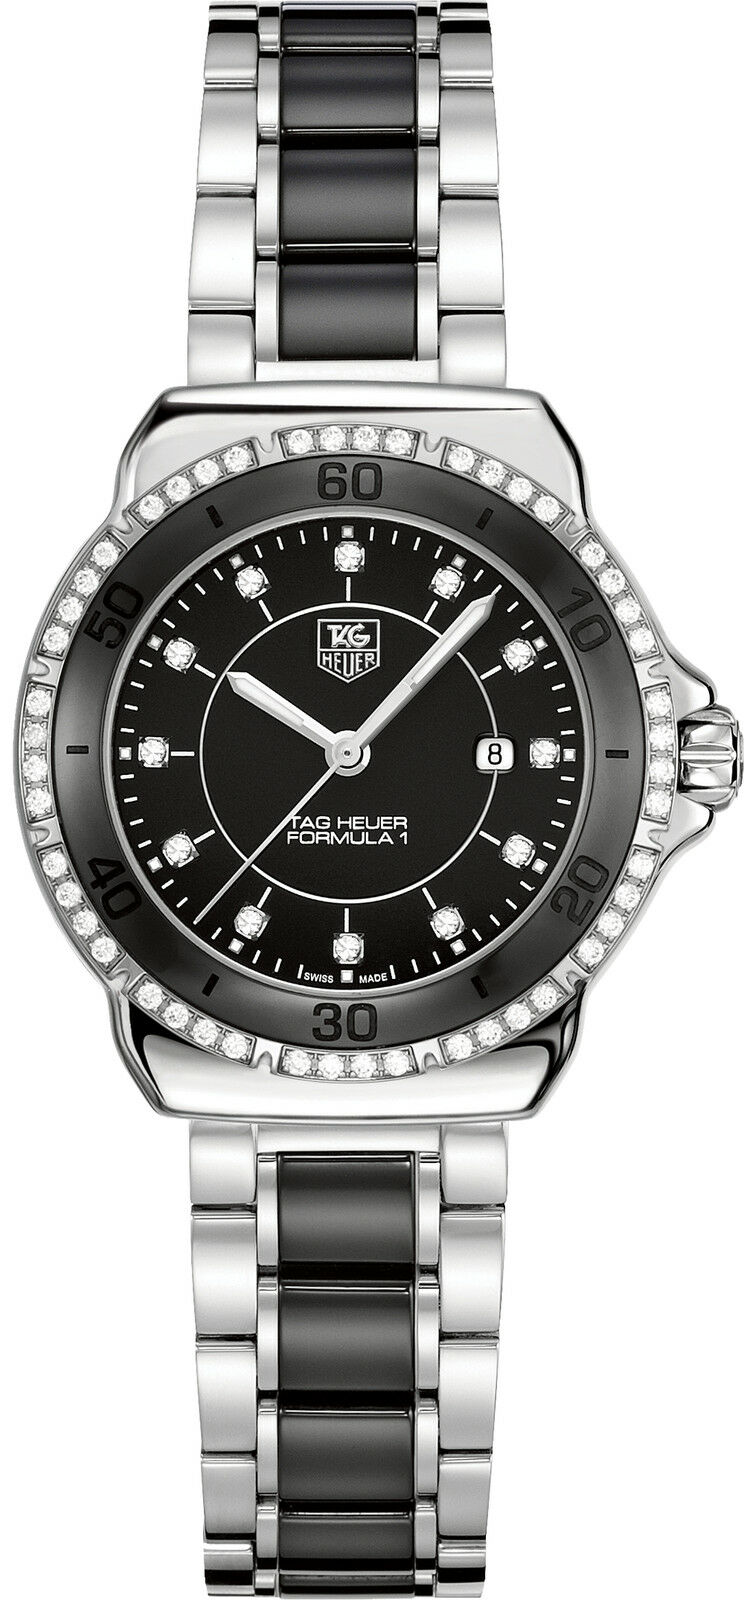 5b2df189ba7 Heuer TAG Formula 1 WAH1312.BA0867 Wrist Watch for Women for sale ...